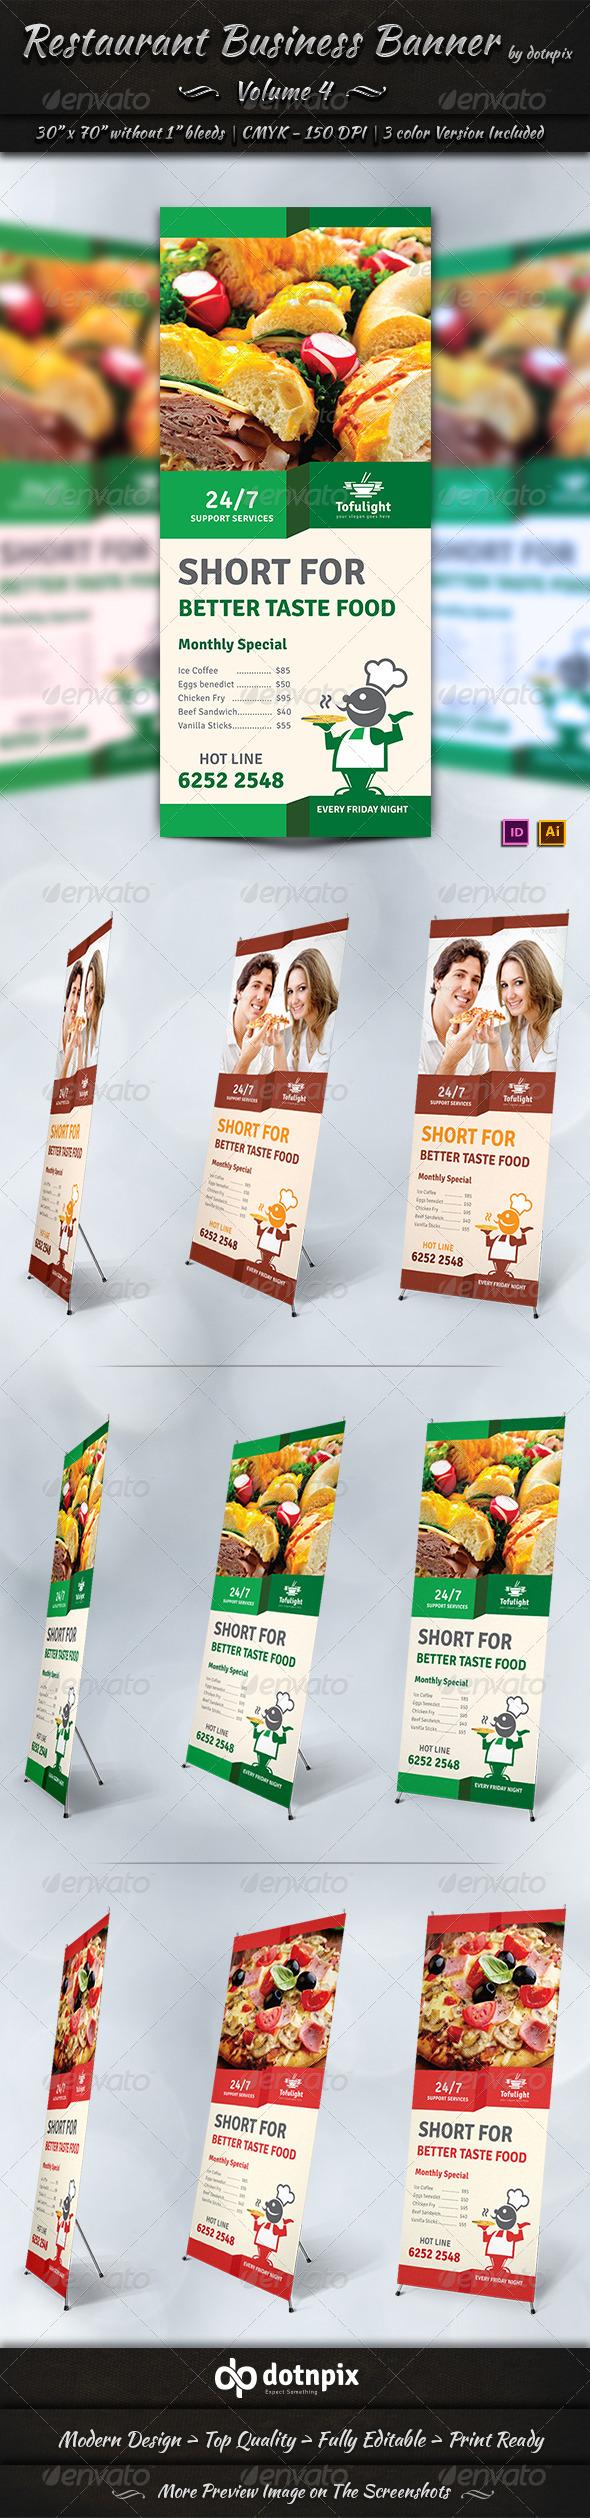 GraphicRiver Restaurant Business Banner Volume 4 7309651